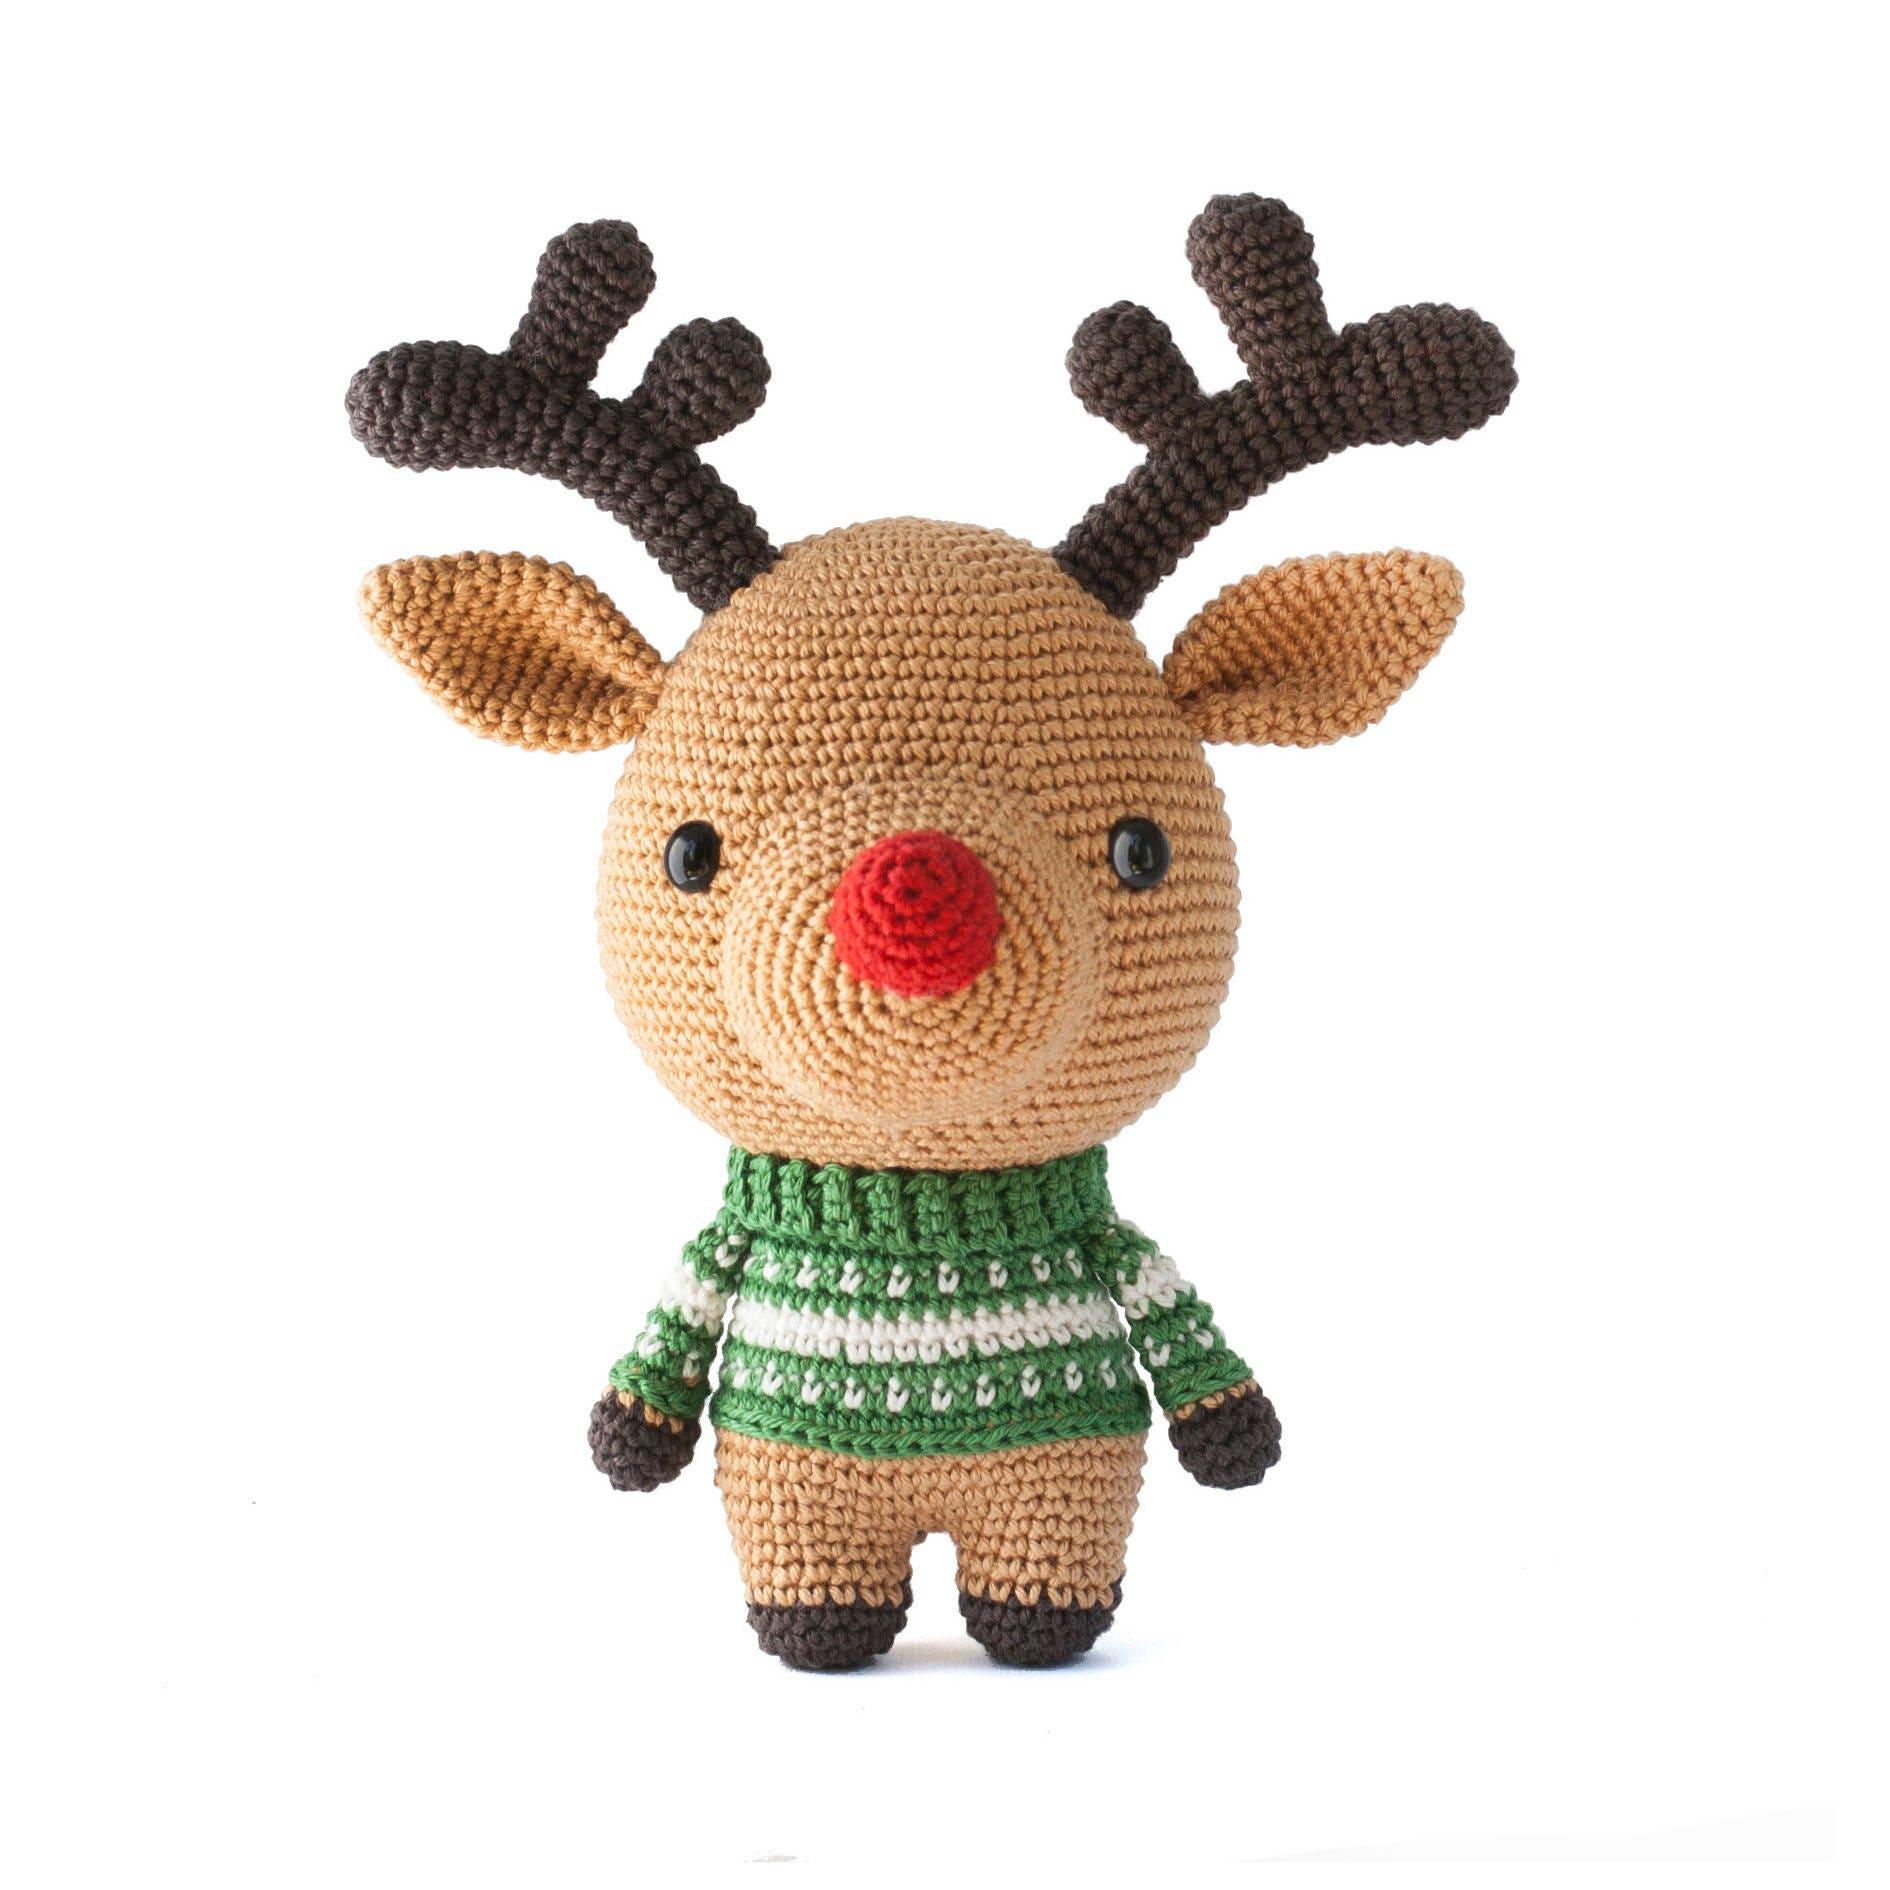 Rudolph the reindeer crochet pattern pdf amigurumi zoom bankloansurffo Choice Image